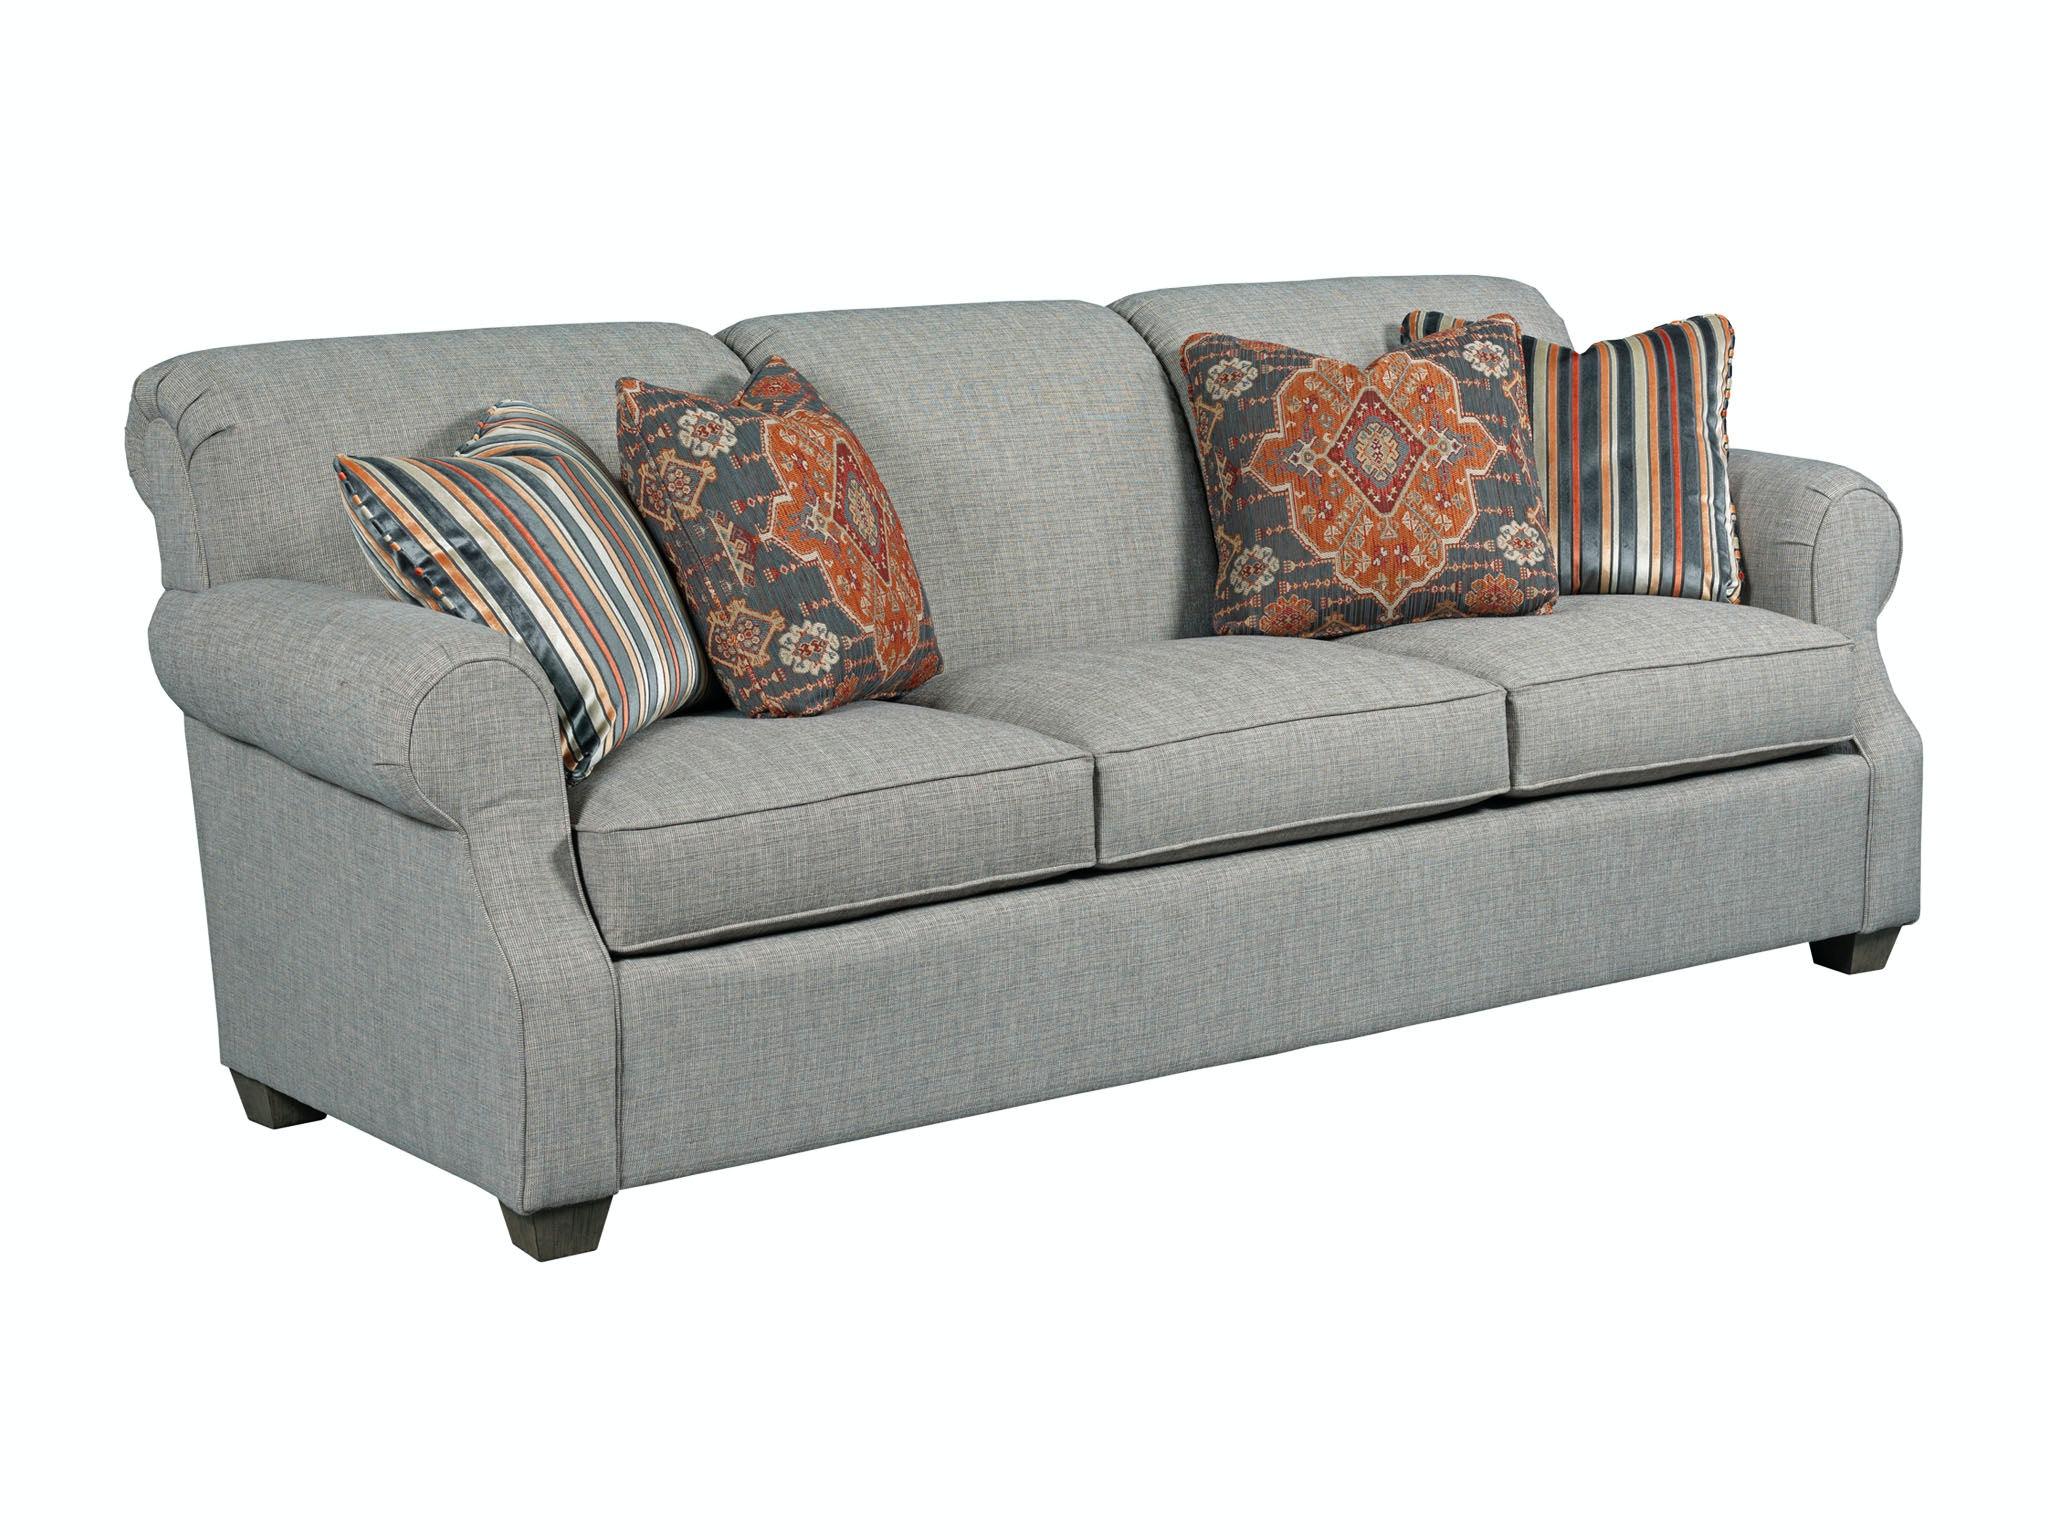 Kincaid Furniture Living Room Lynchburg Grande Sofa 814 87 At Great Deals  On Furniture